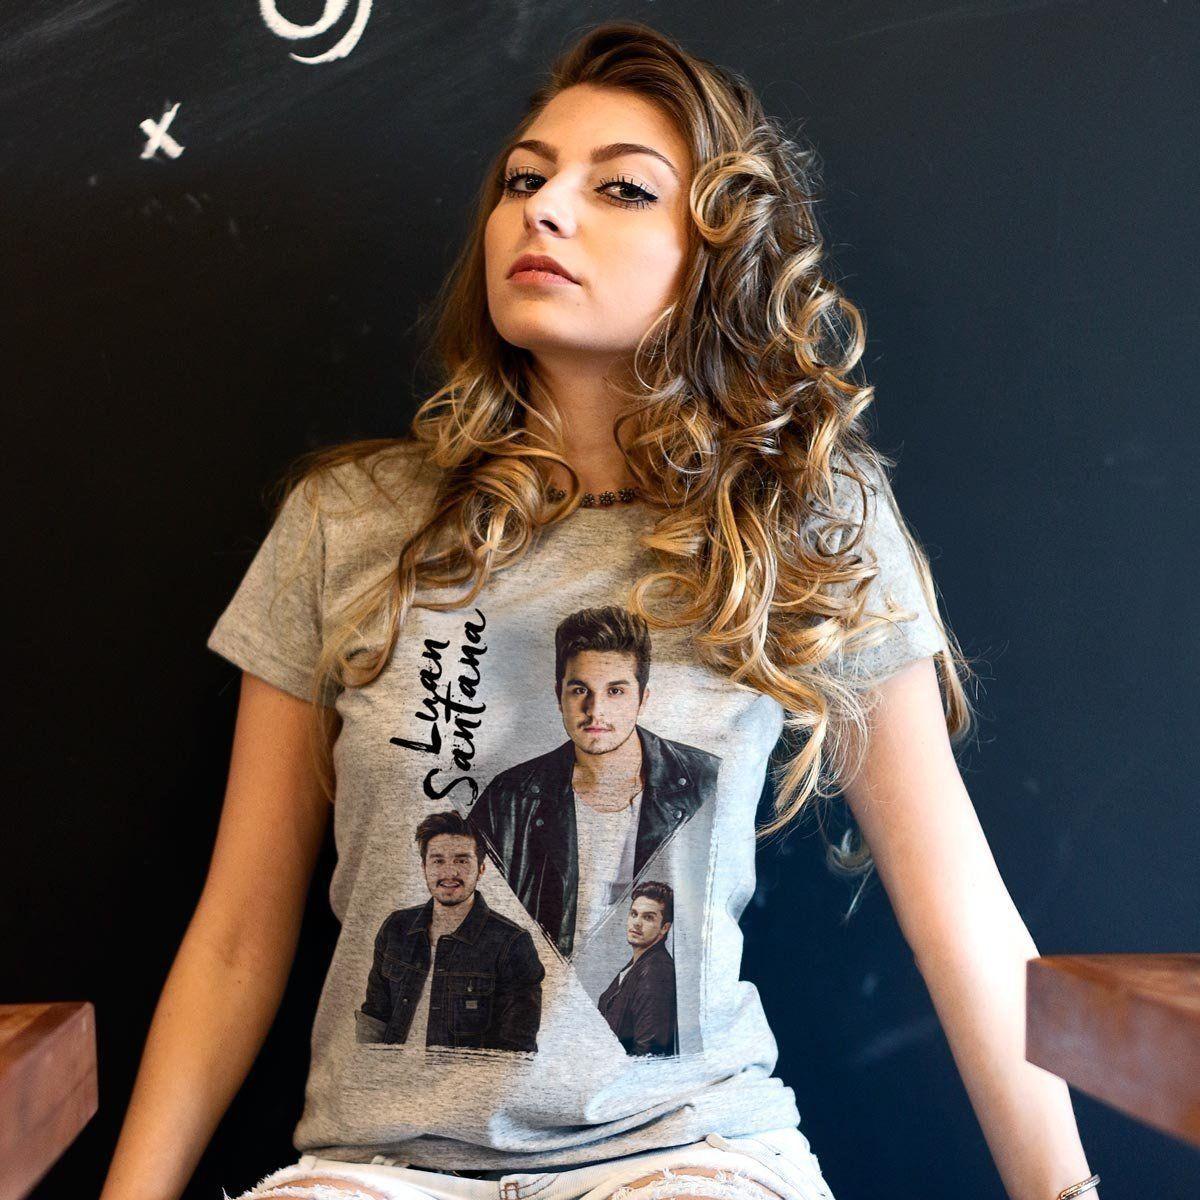 Camiseta Feminina Luan Santana Poses Oficial  - bandUP Store Marketplace